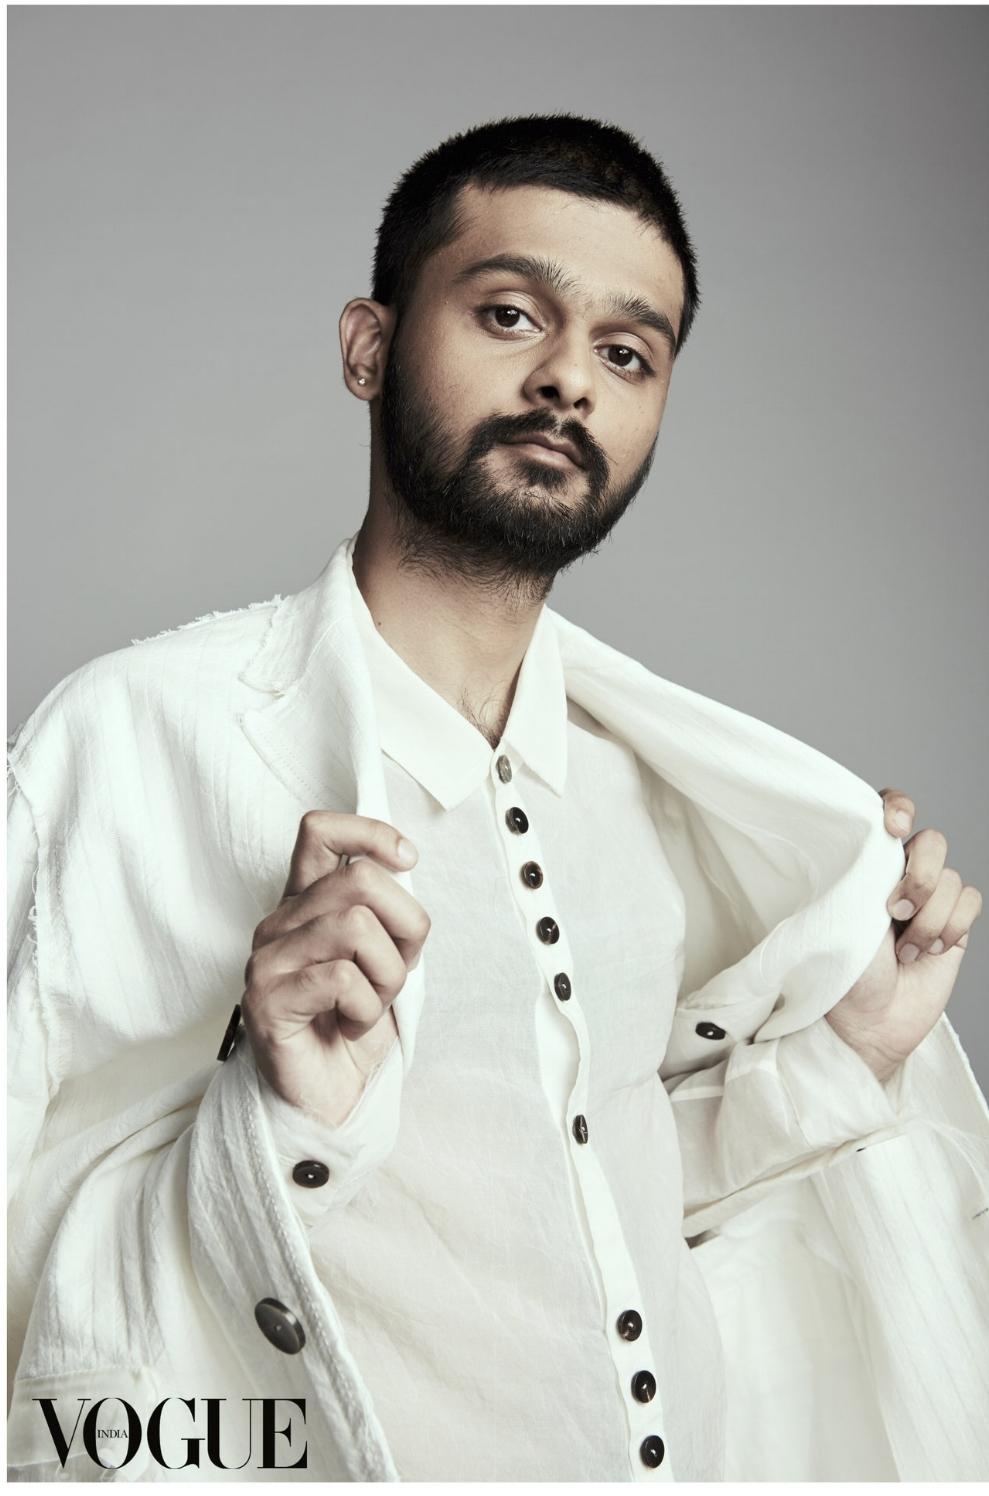 Vogue/ Sid Dhananjay/ Michael Becker